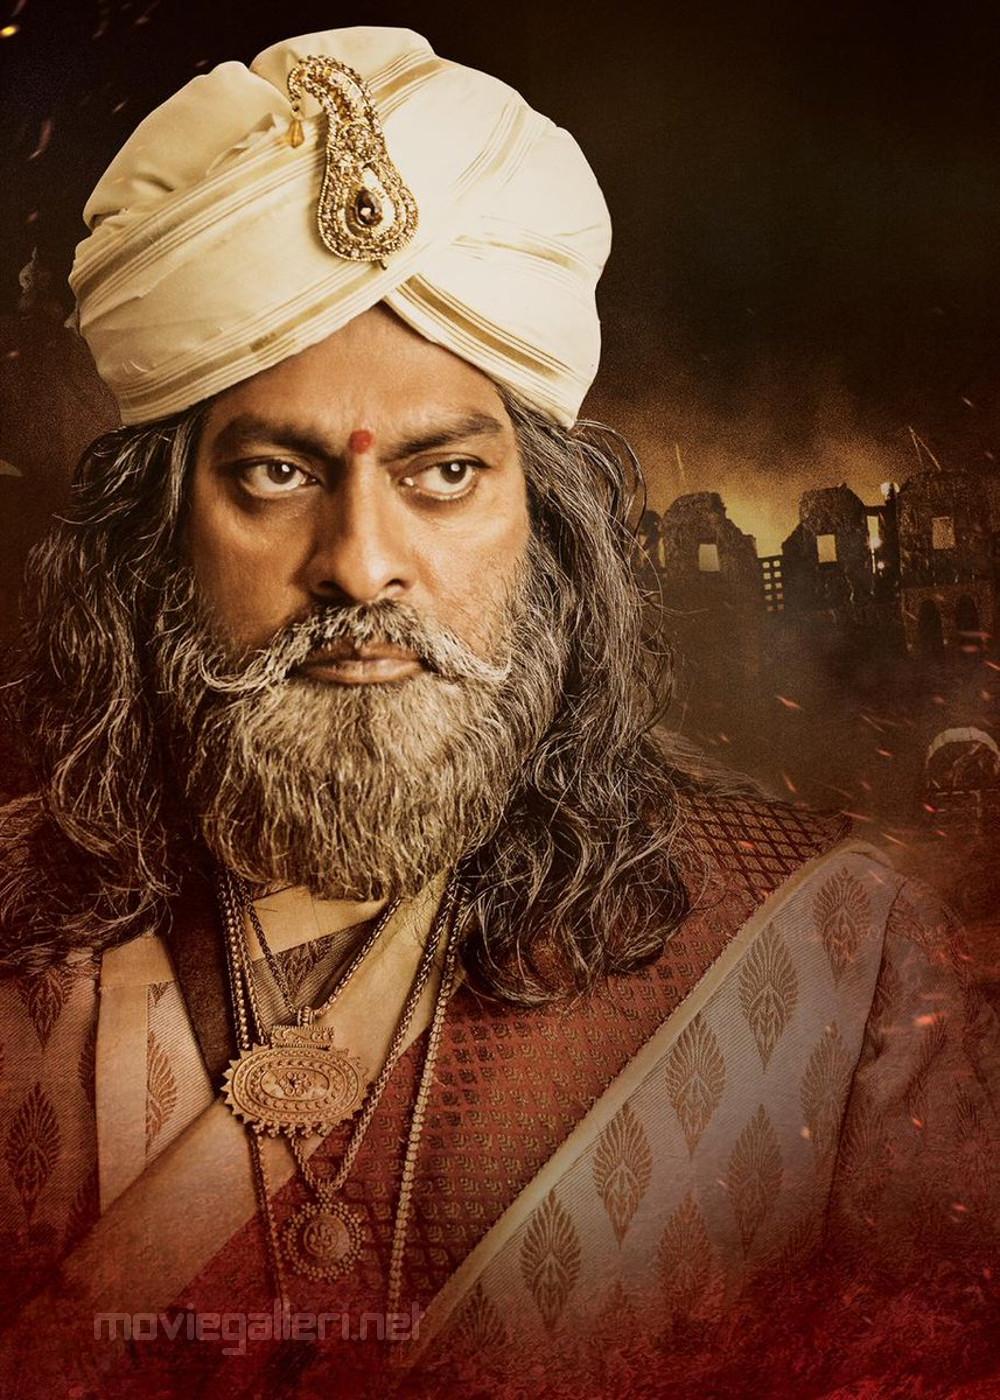 Jagapathi Babu as Veera Reddy From Sye Raa Narasimha Reddy